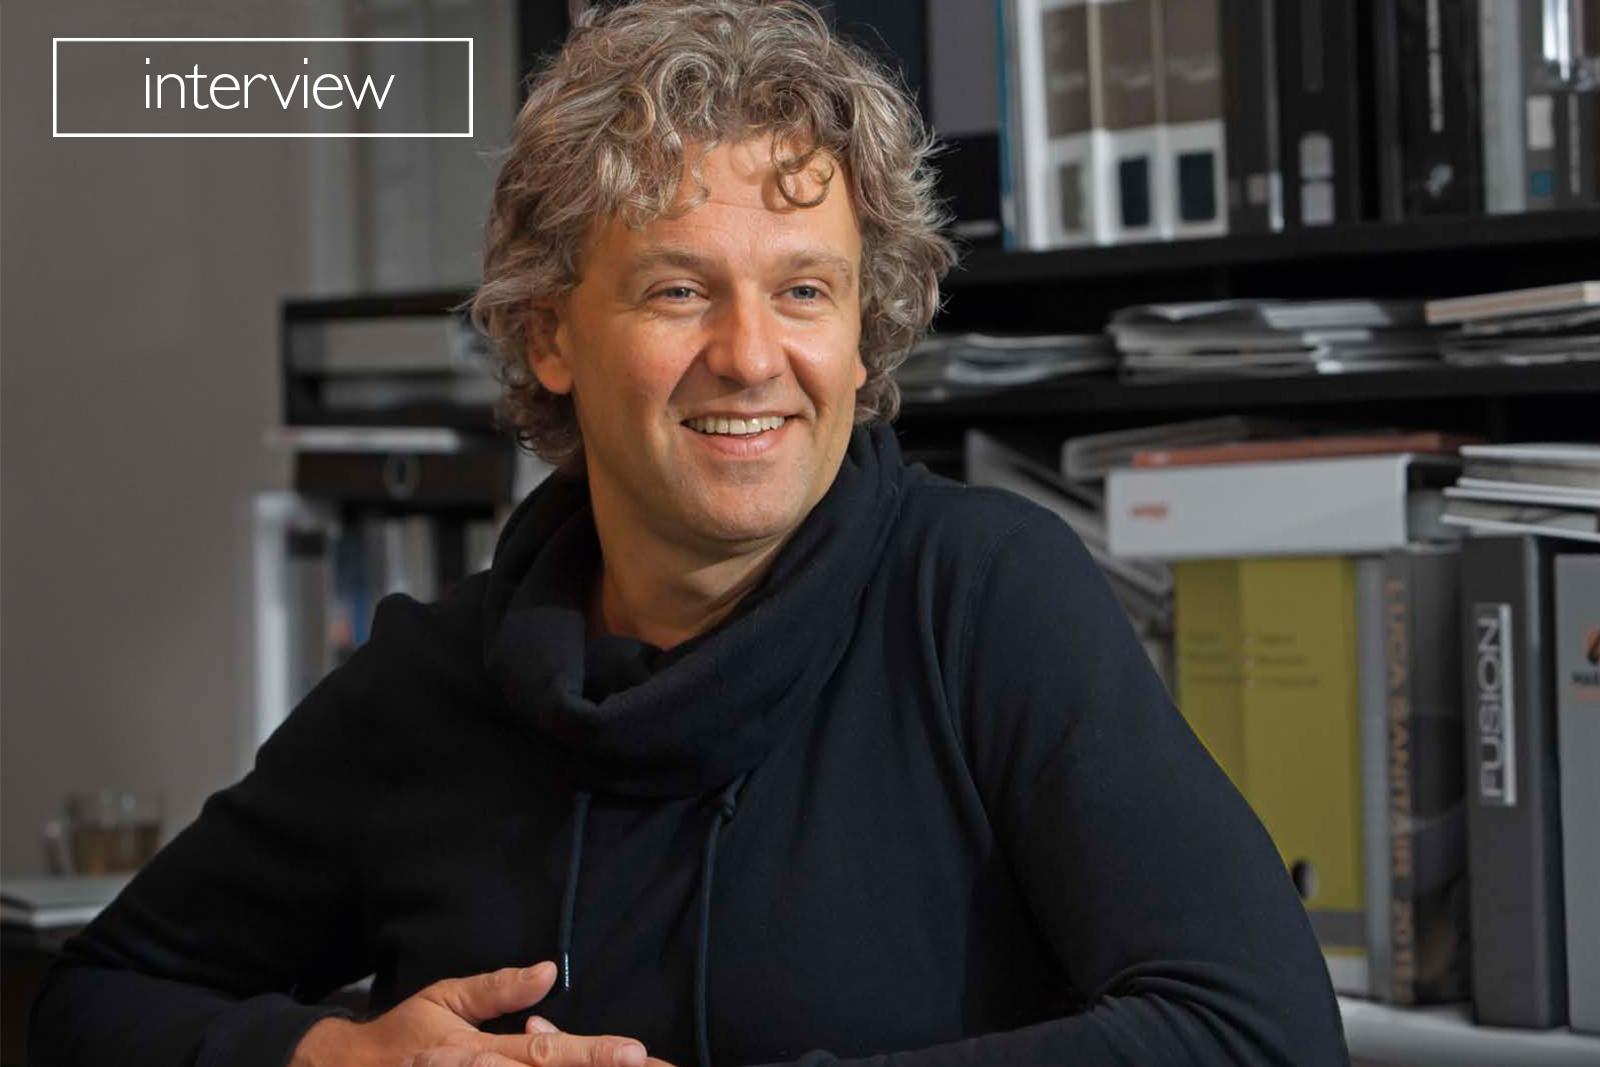 viega-Jeroen-de-Nijs-interview-latest-news